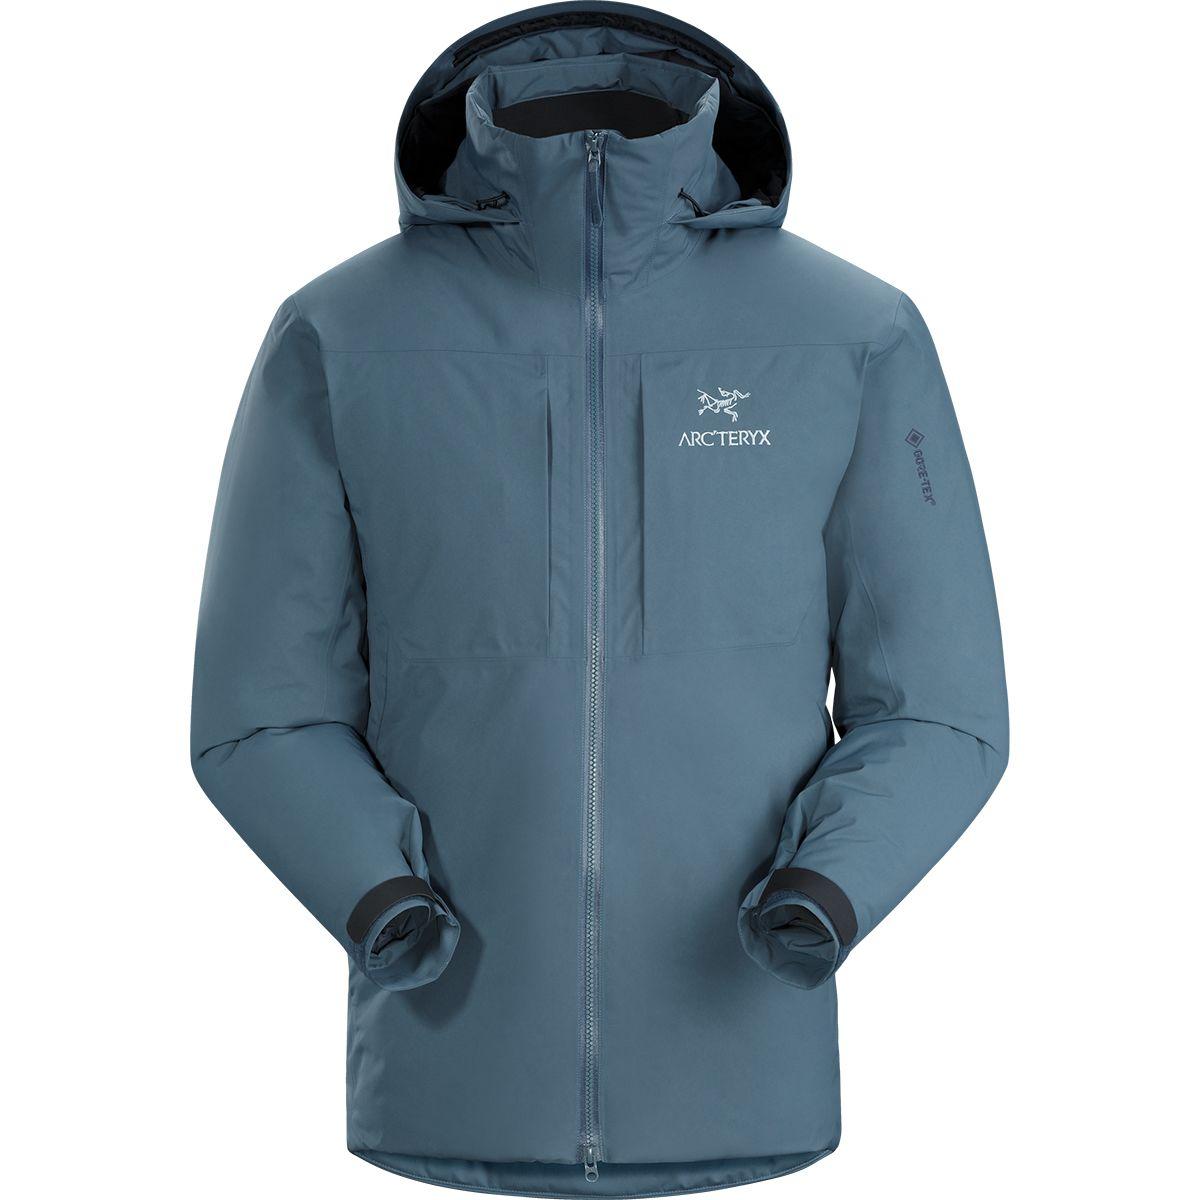 Arc'teryx Fission SV Jacket